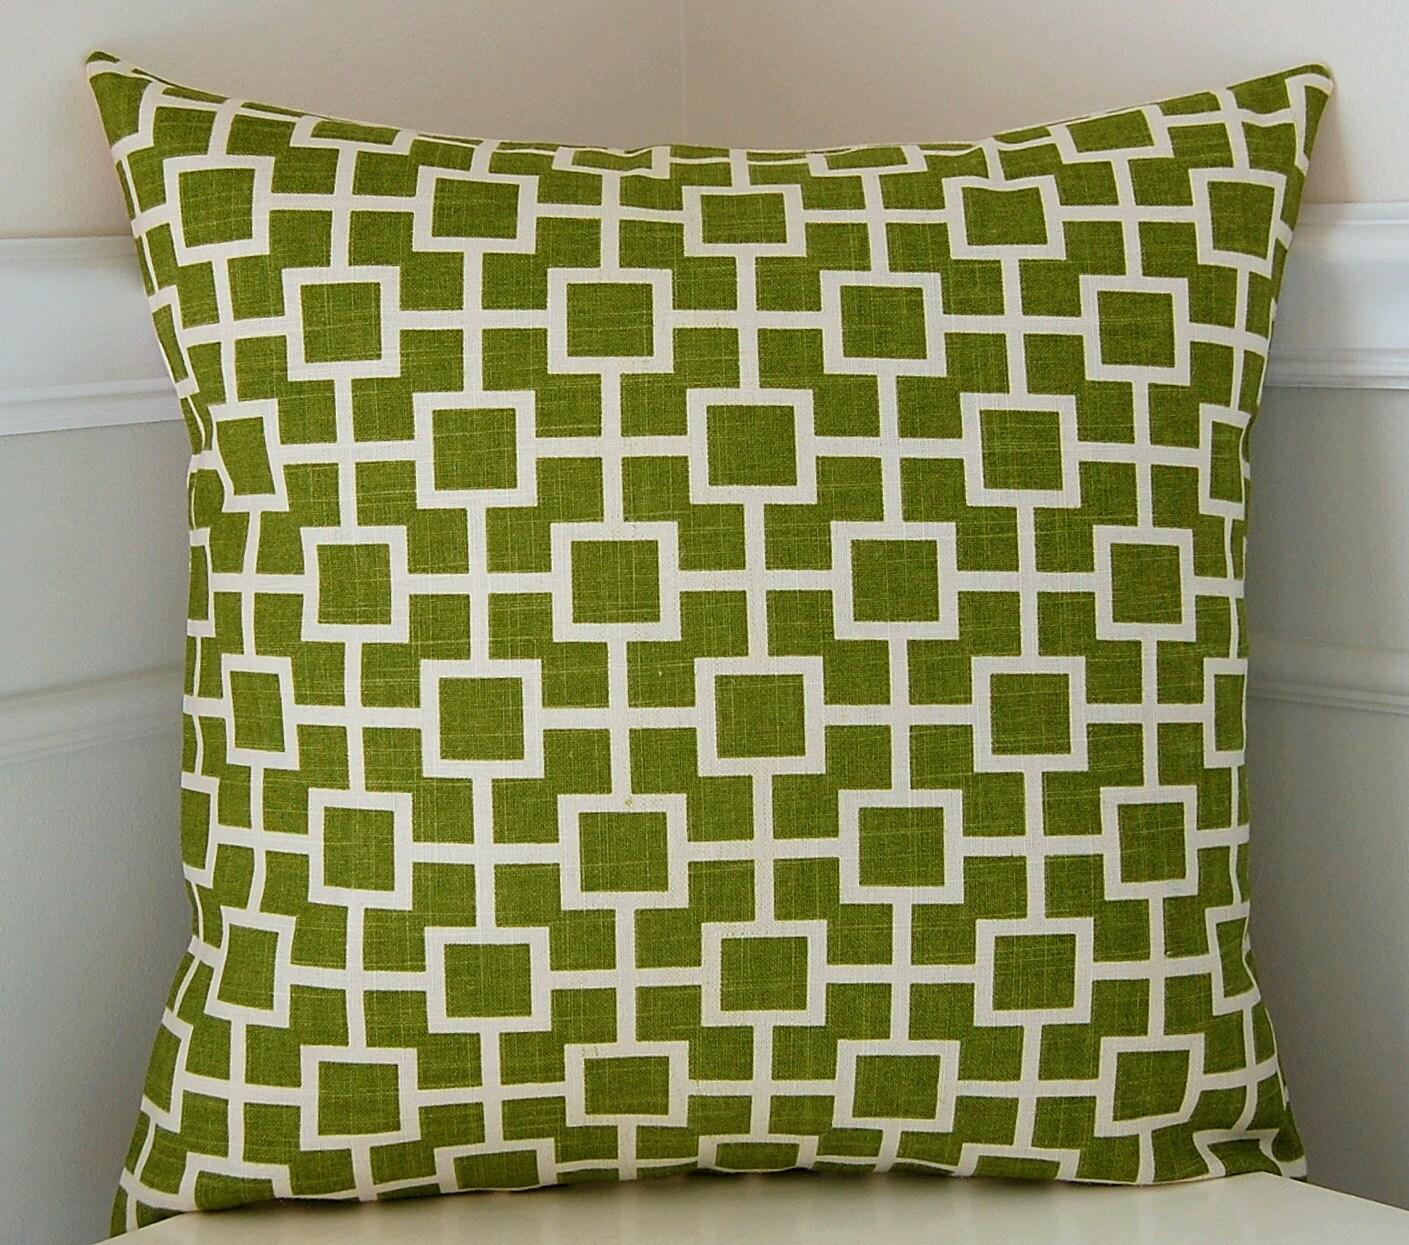 Green Geometric Pillow Cover Green & White Throw Pillow